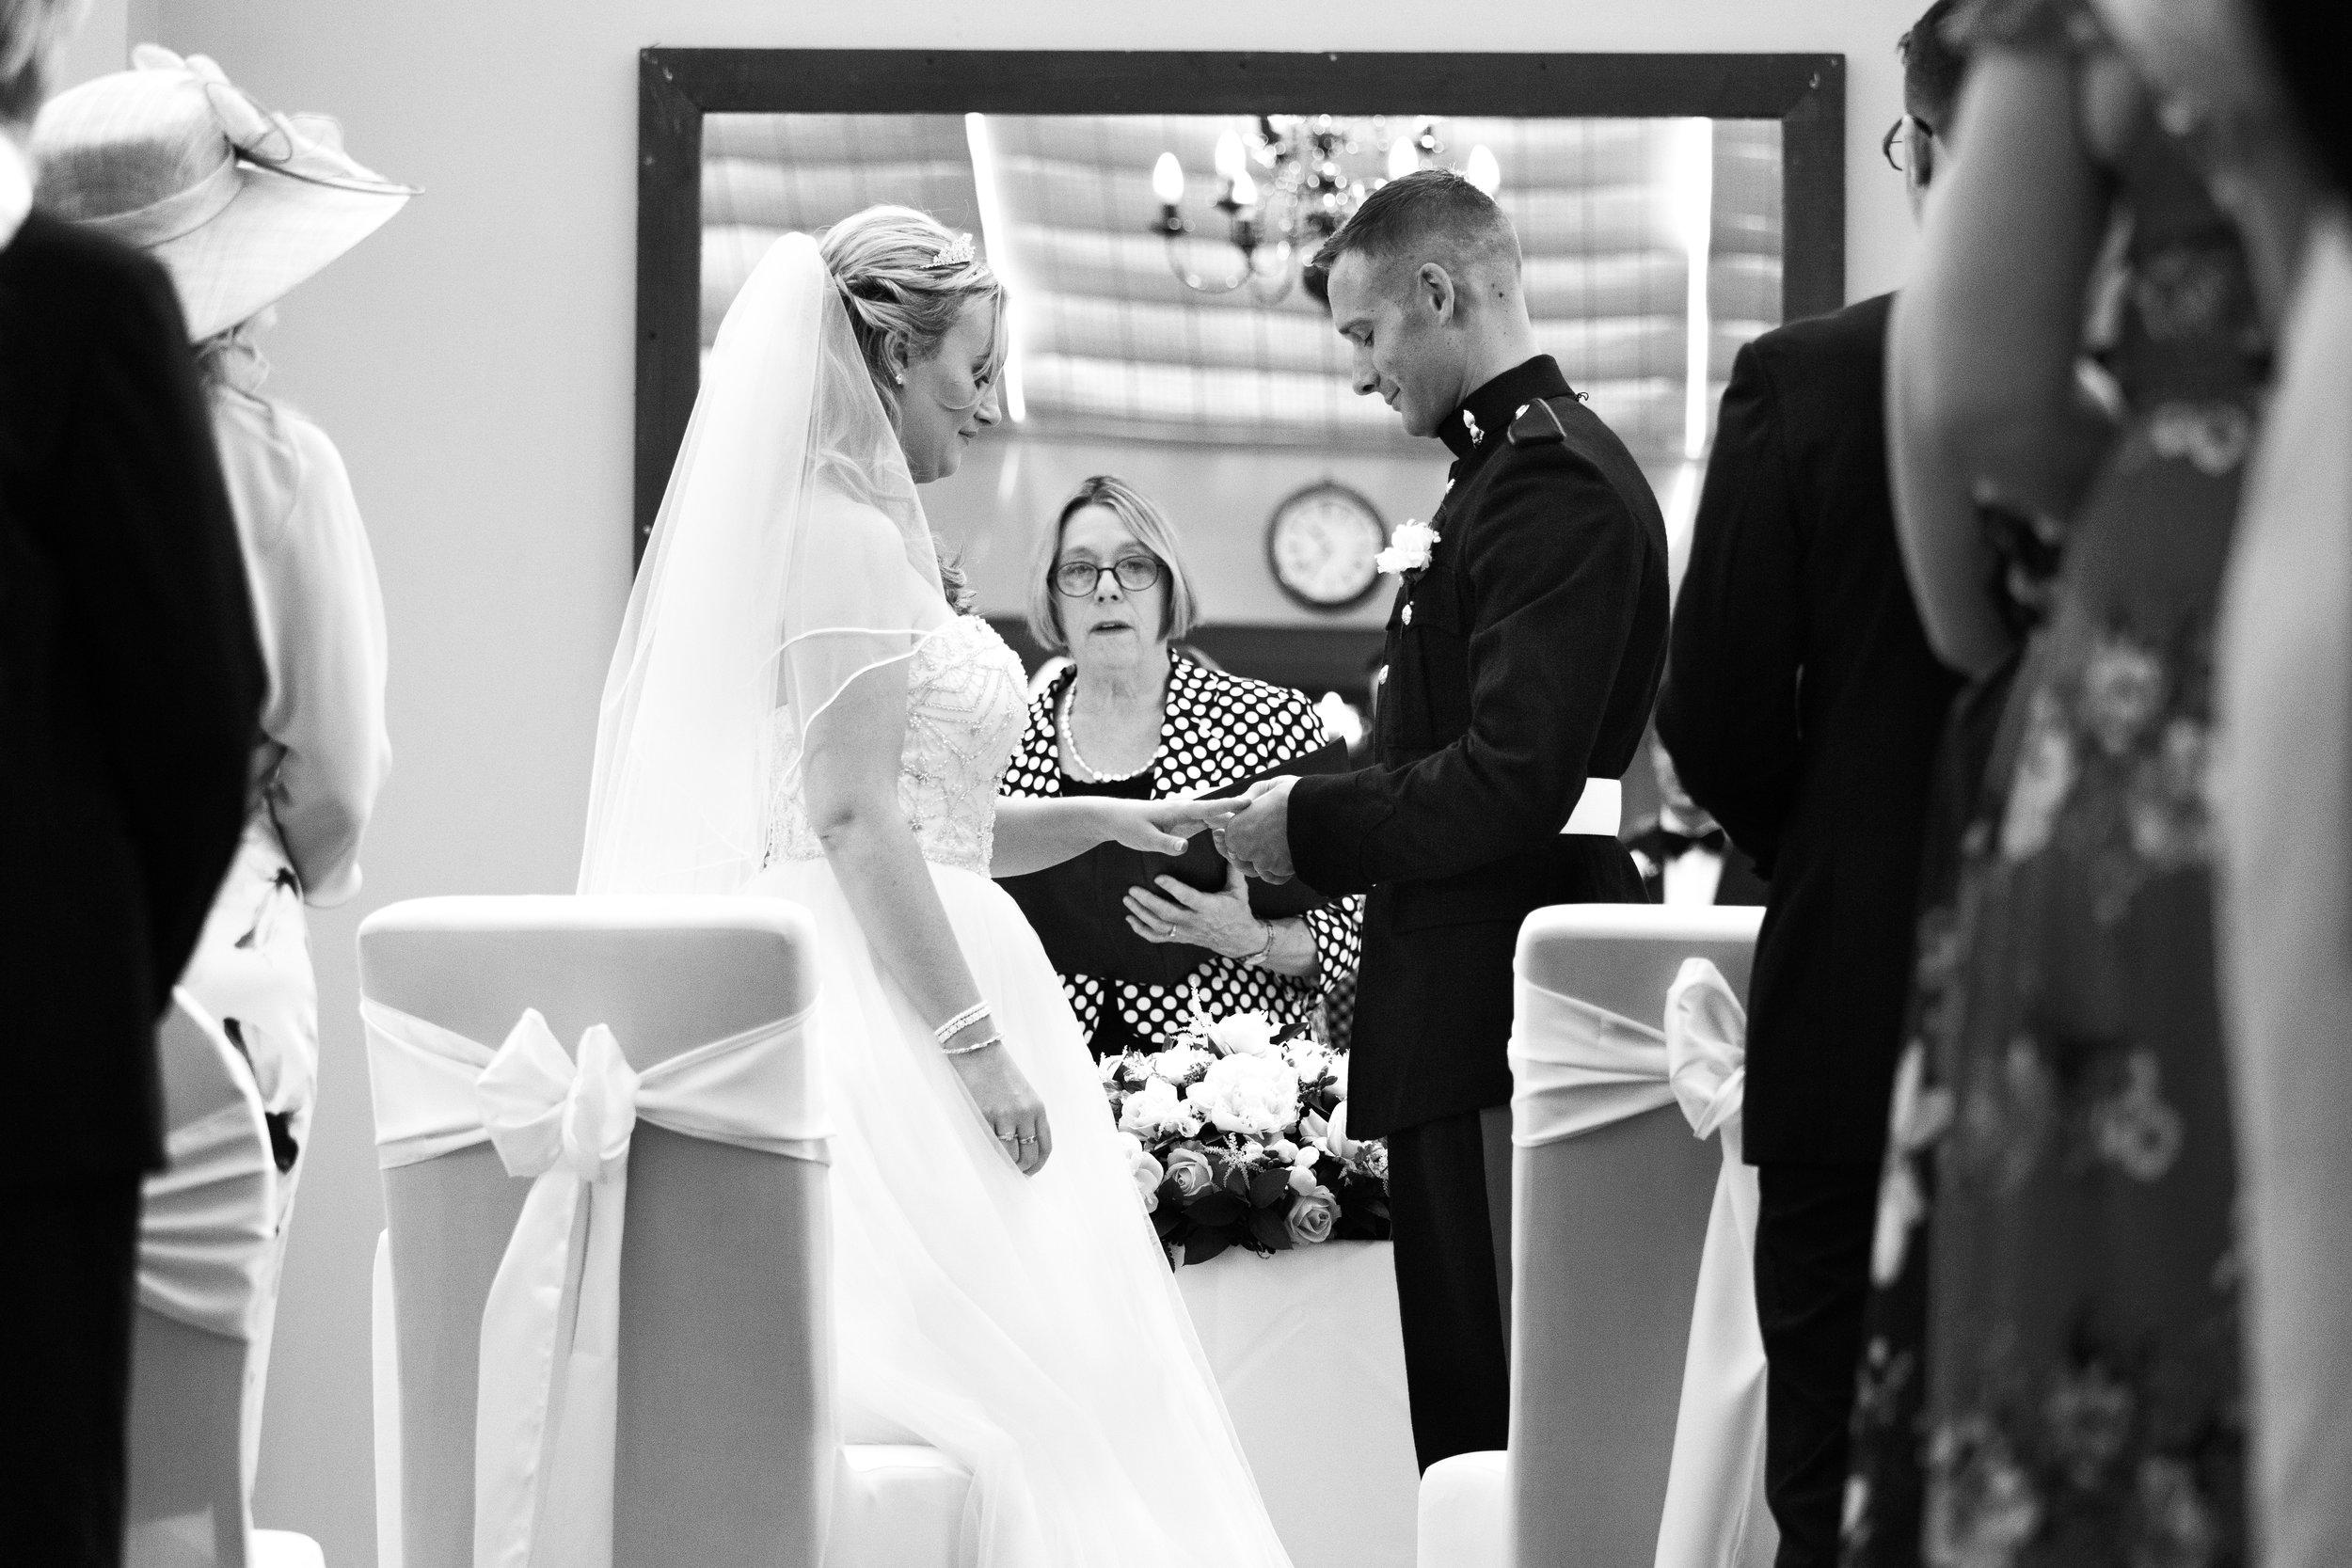 wedding-lea-cooper-photography-willenhall-west-midlands-wolverhampton-dudley-birmingham-uk-marriage-hadley-park-east-telford.rings.jpg